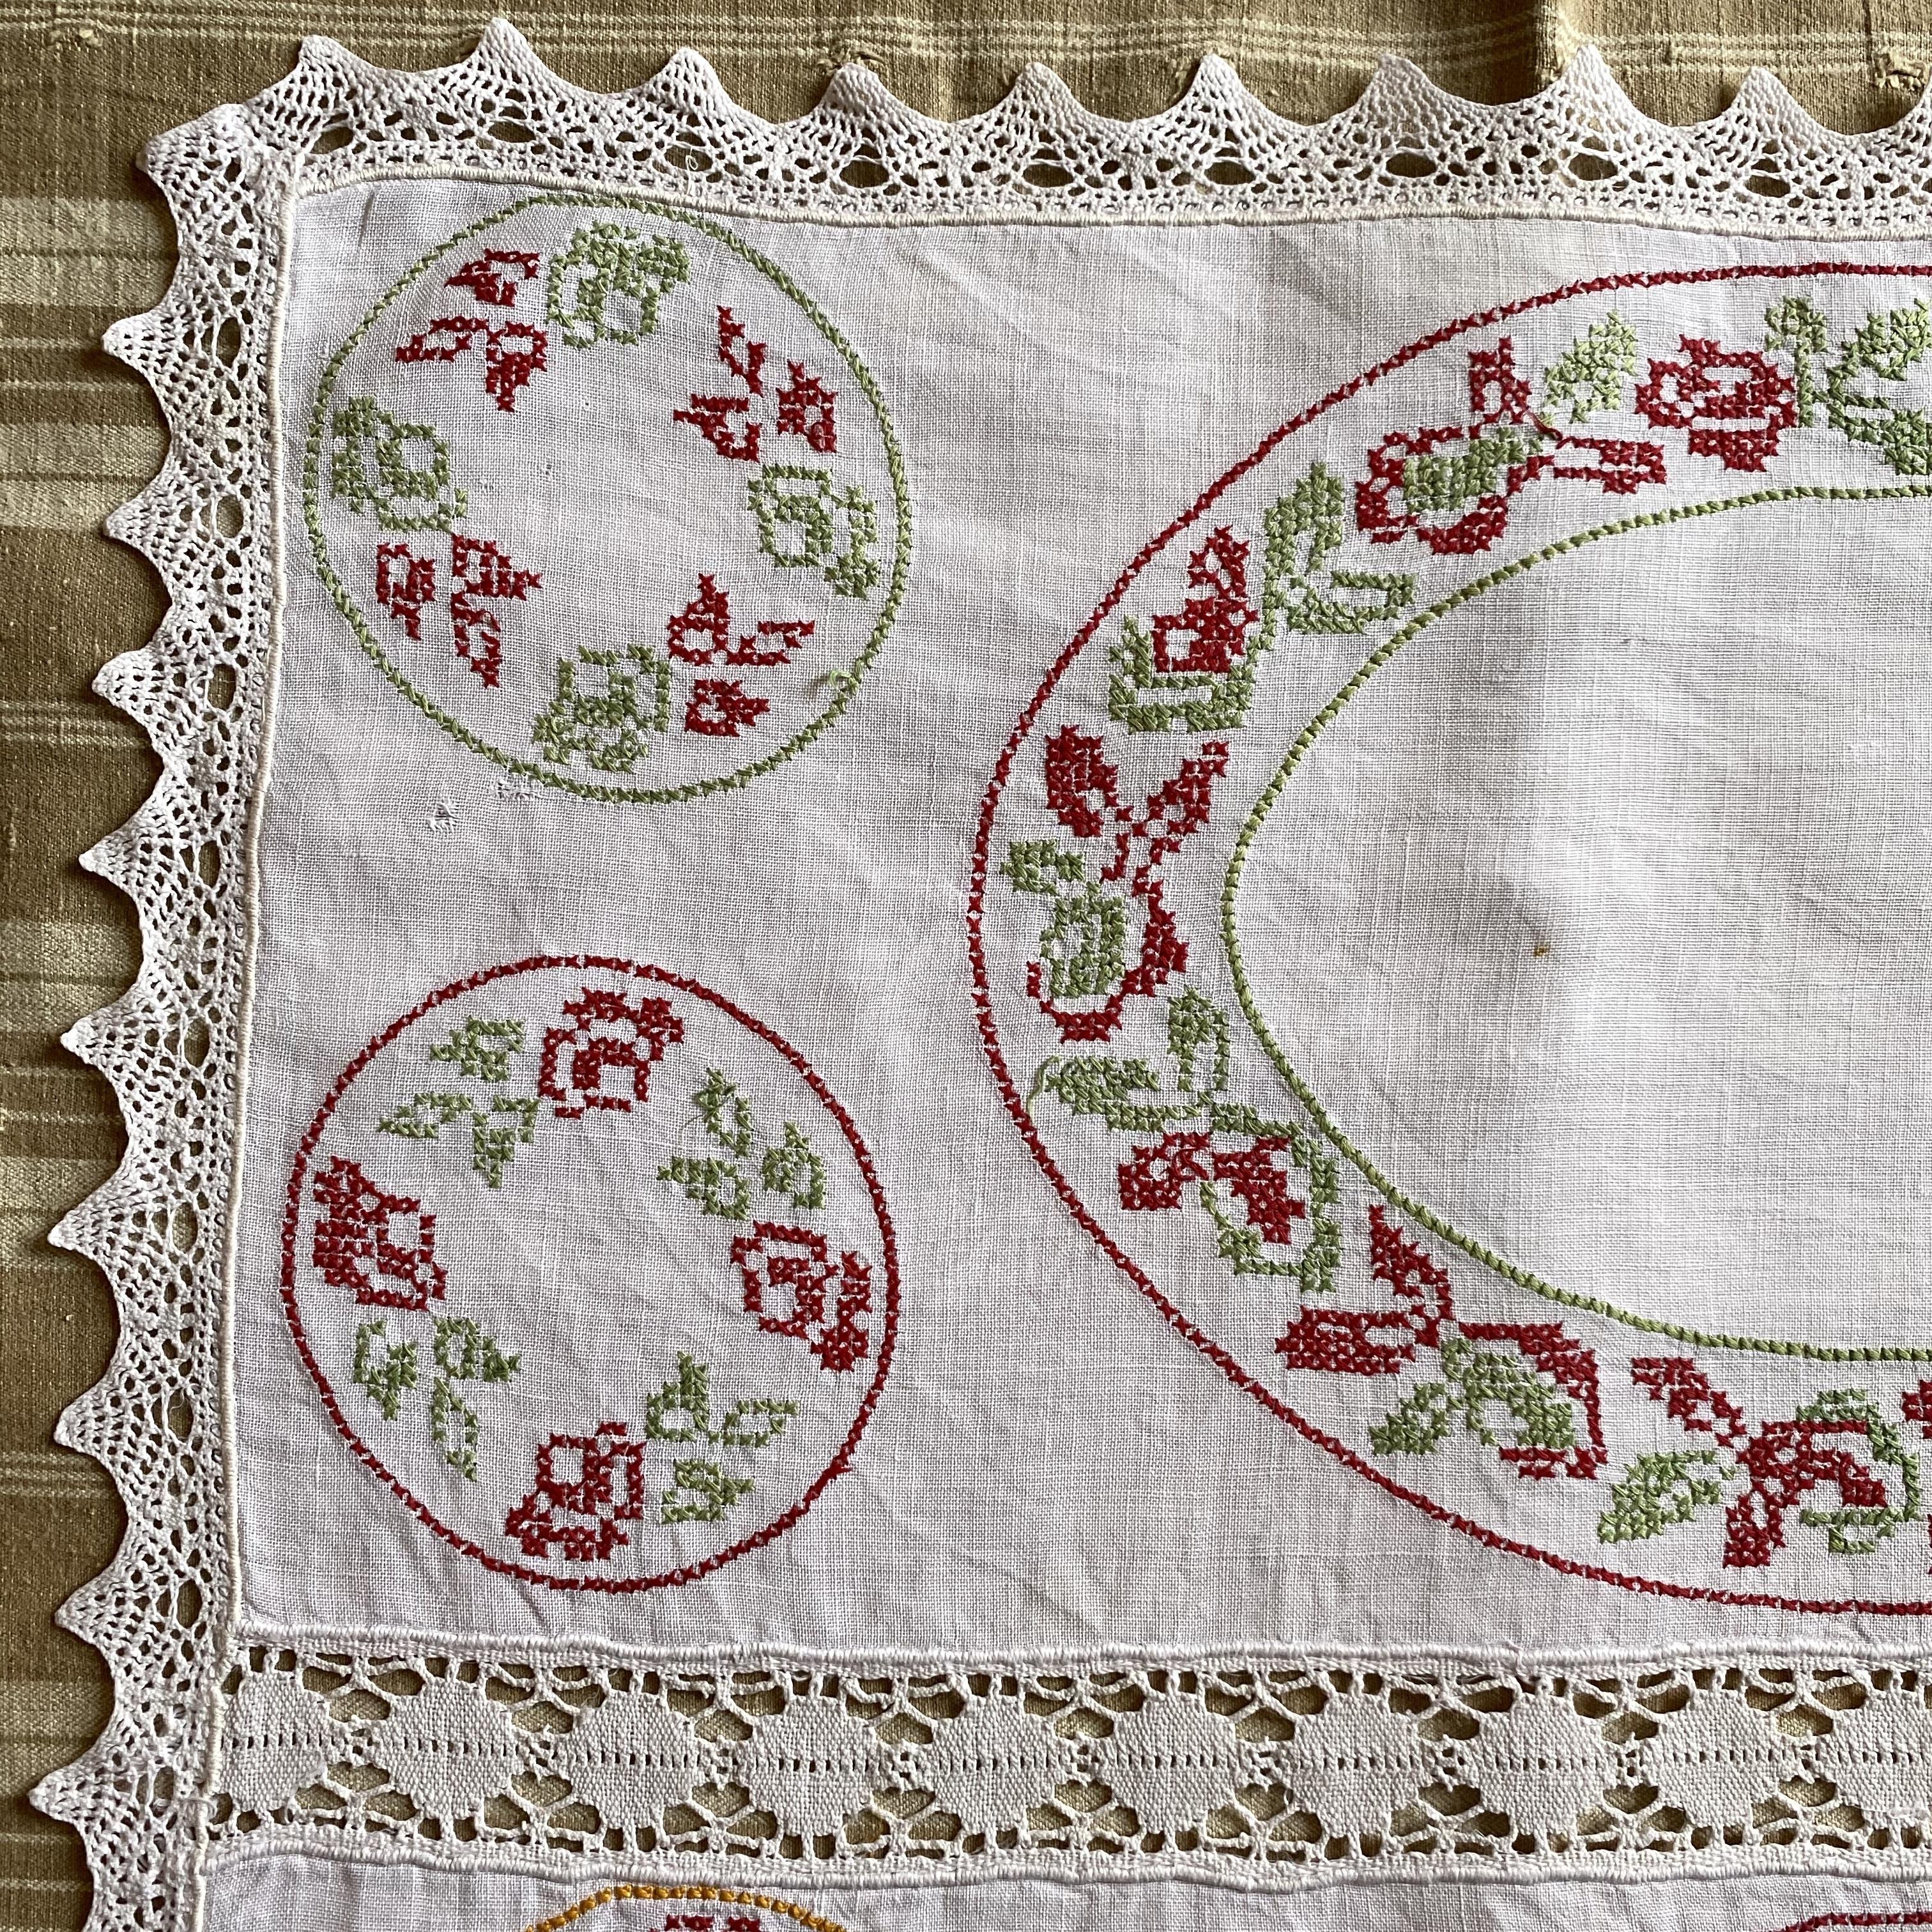 France ヴィンテージ手刺繍ドイリー・オーバルプレート/ uv0095